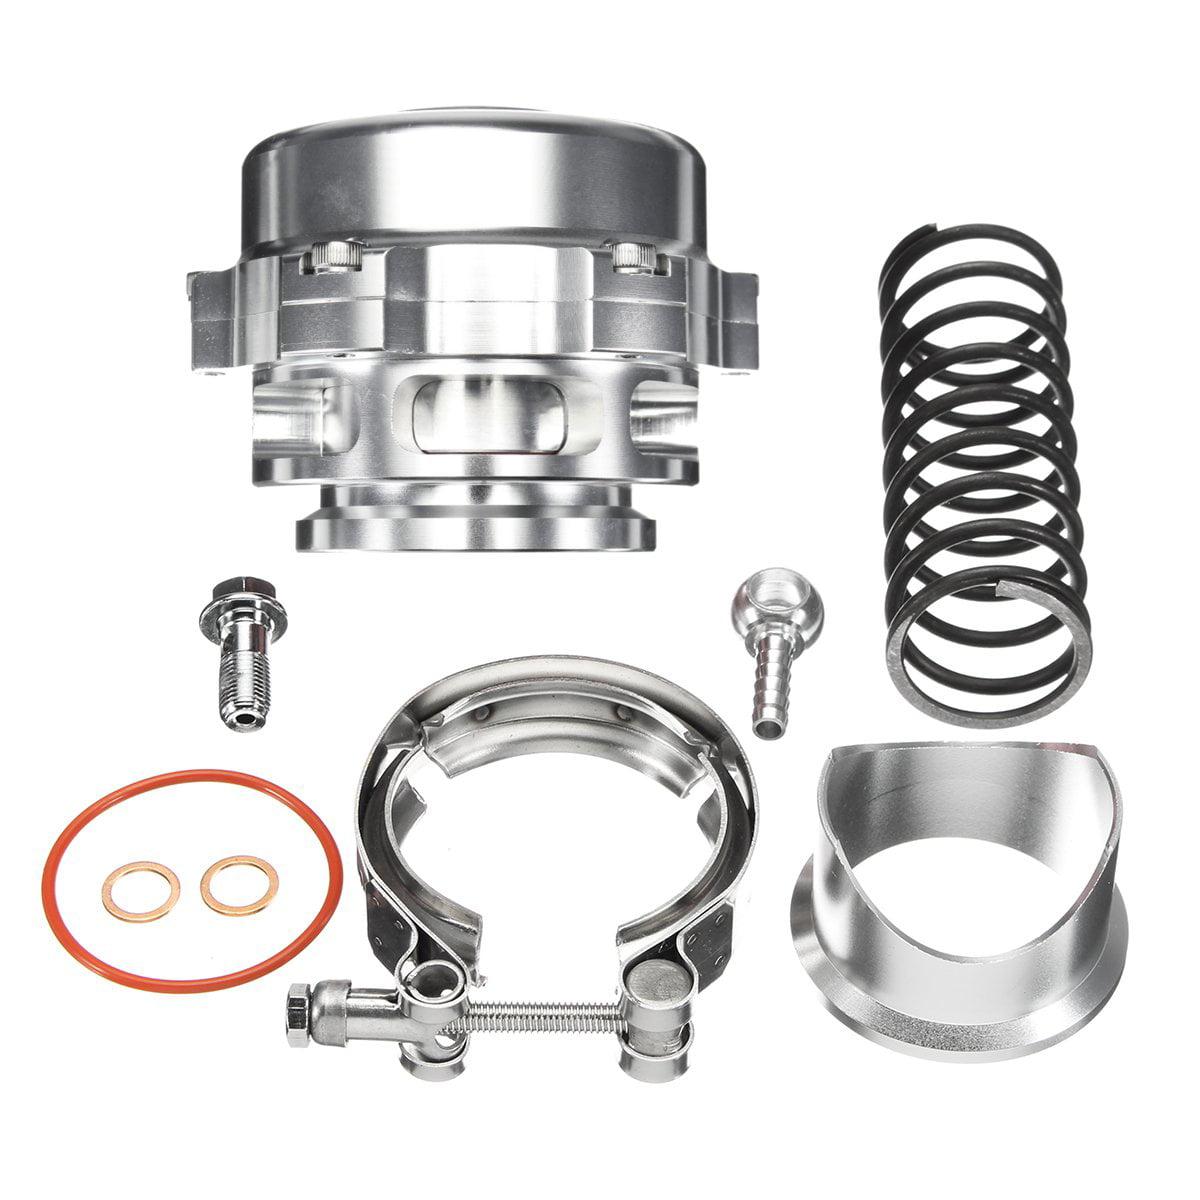 Universal turbo 35 PSI 50mm Aluminum Turbo BOV Intercooler Boost V-BAND Blow Off Valve